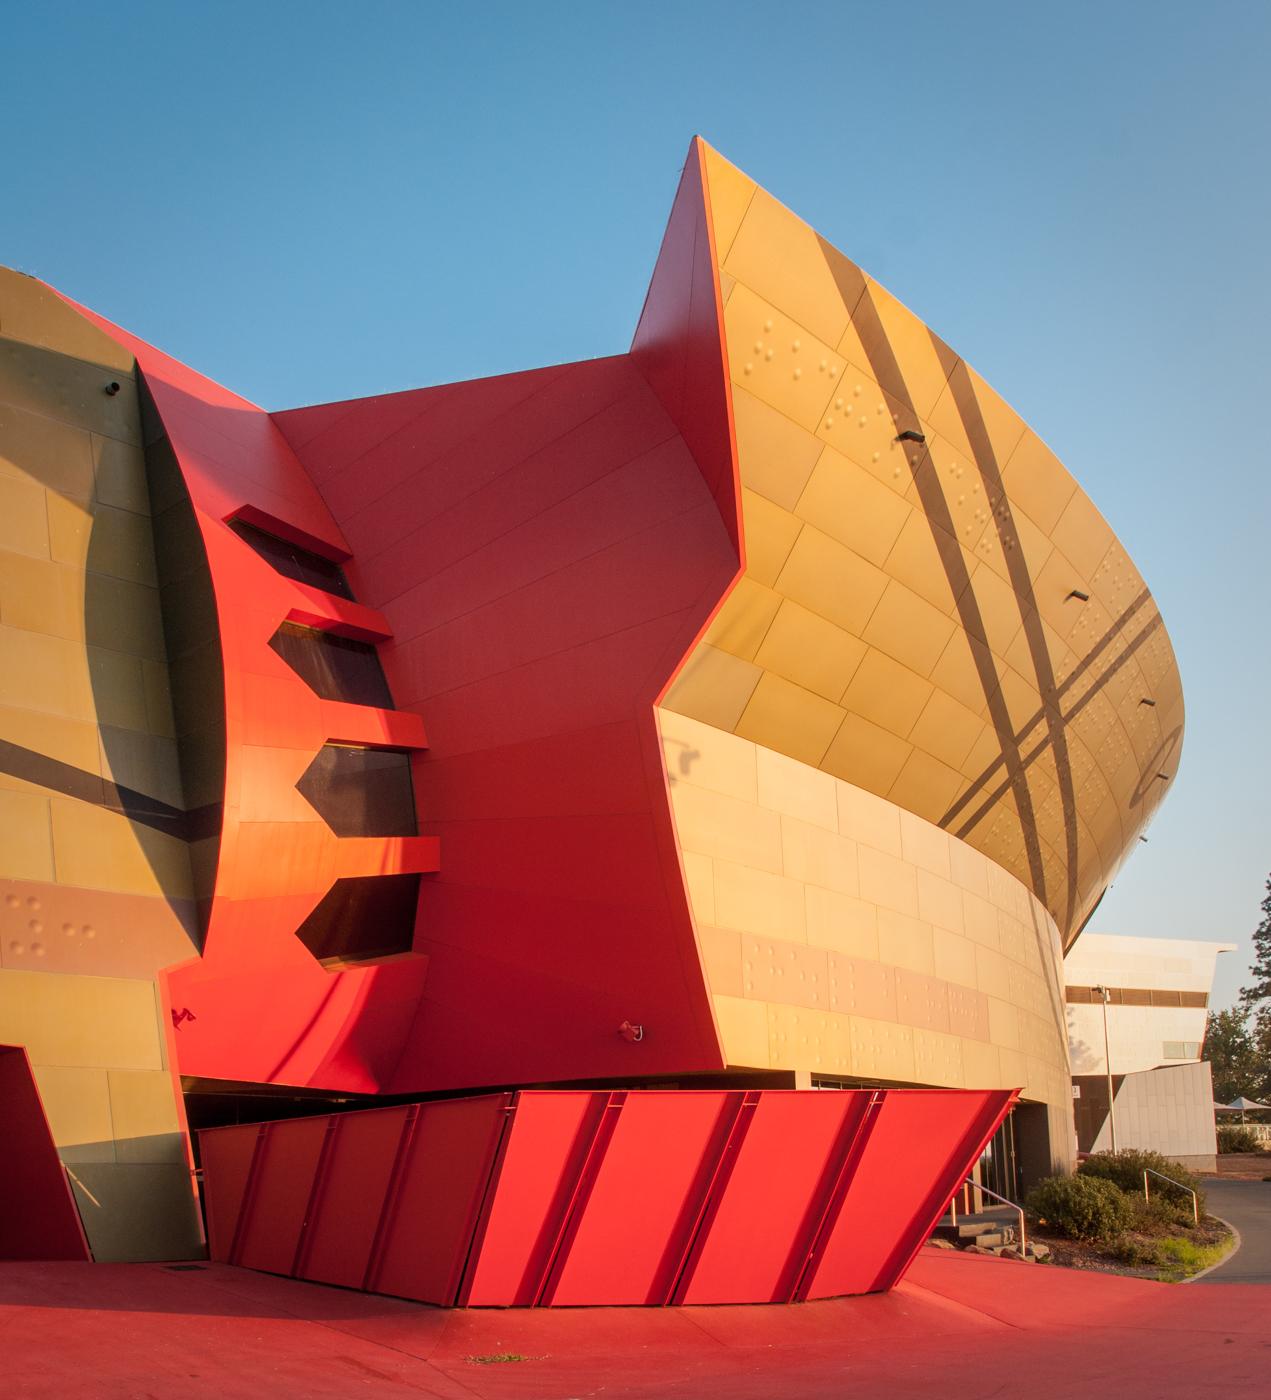 National Museum of Australia, Australia